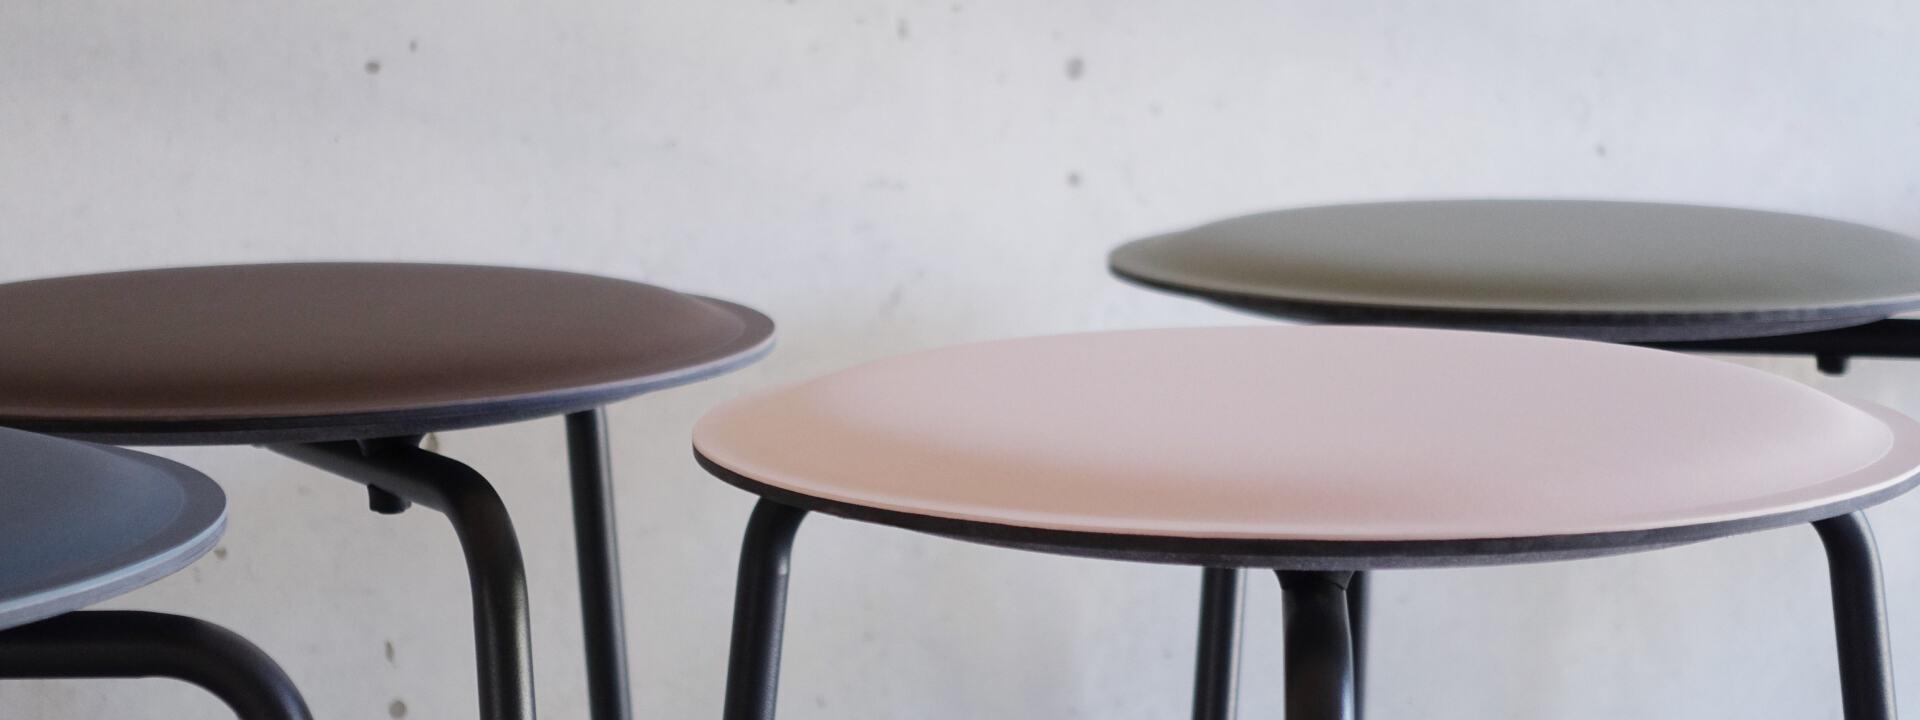 Ravioli Linoleum Hocker S, Sitzsysteme